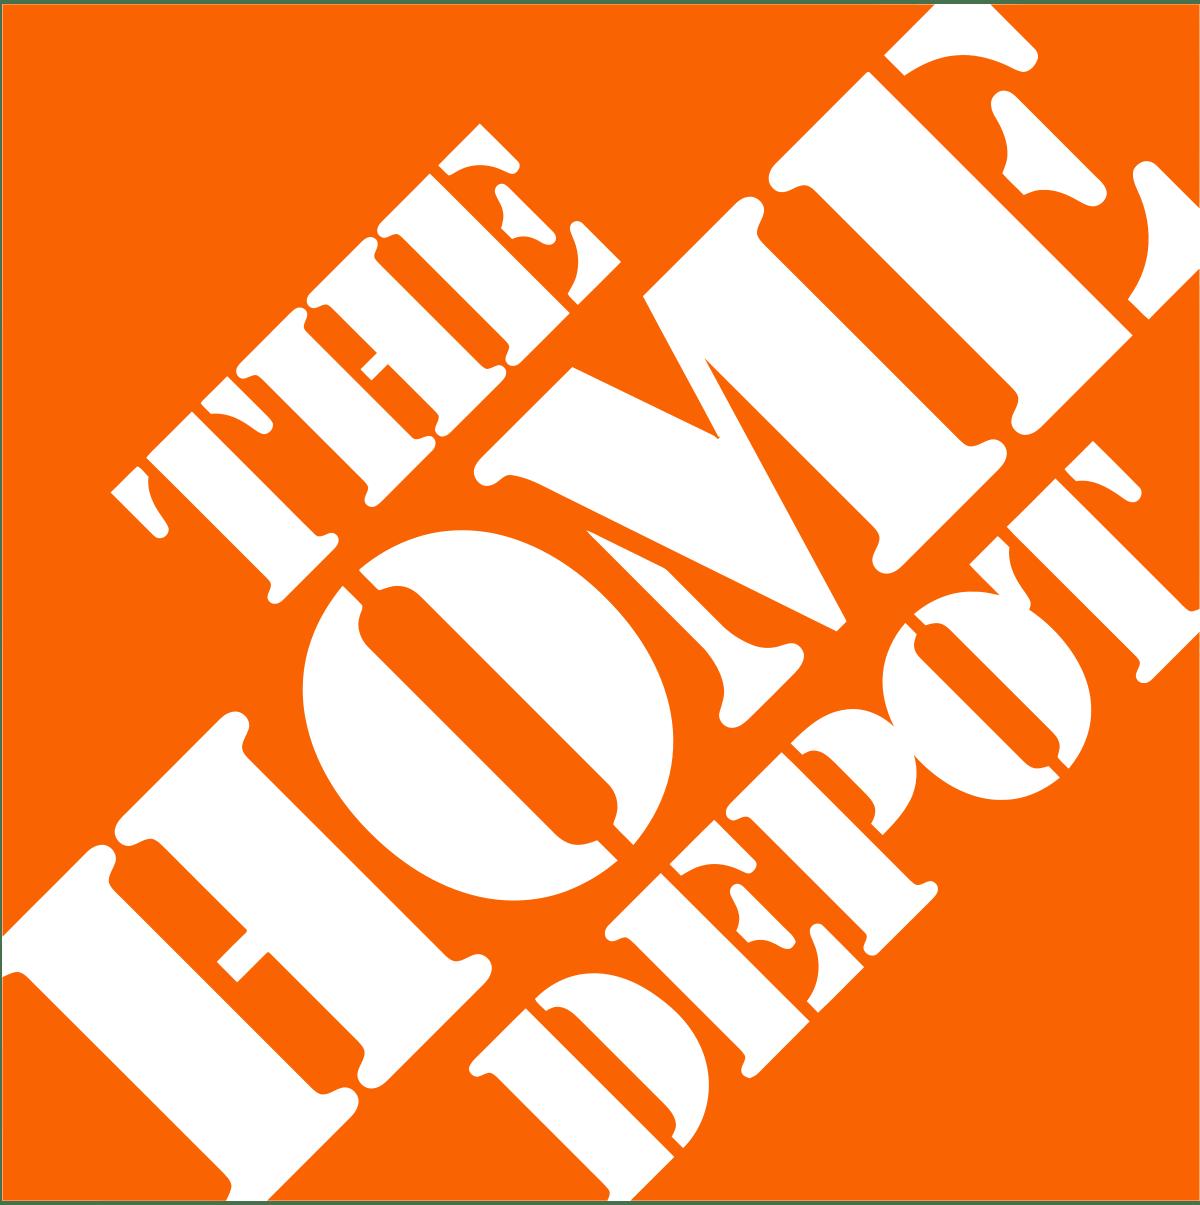 ALLEGATION: Home Depot Botched $16K Storm Window Install, Ignoring Inspectors